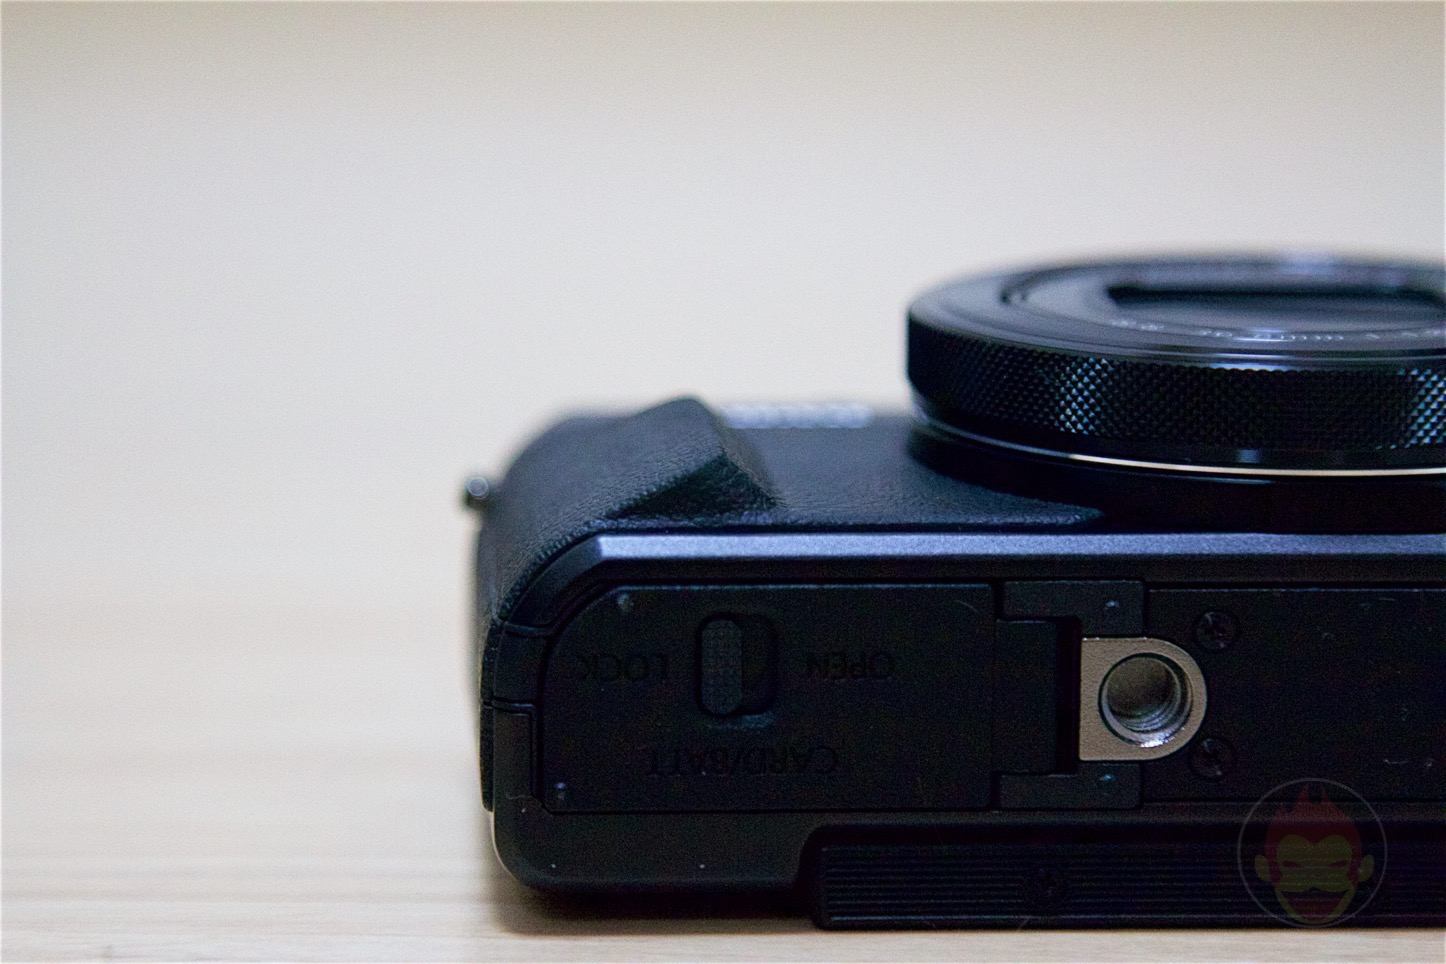 Canon-PowerShot-G7-Mark2-14.jpg